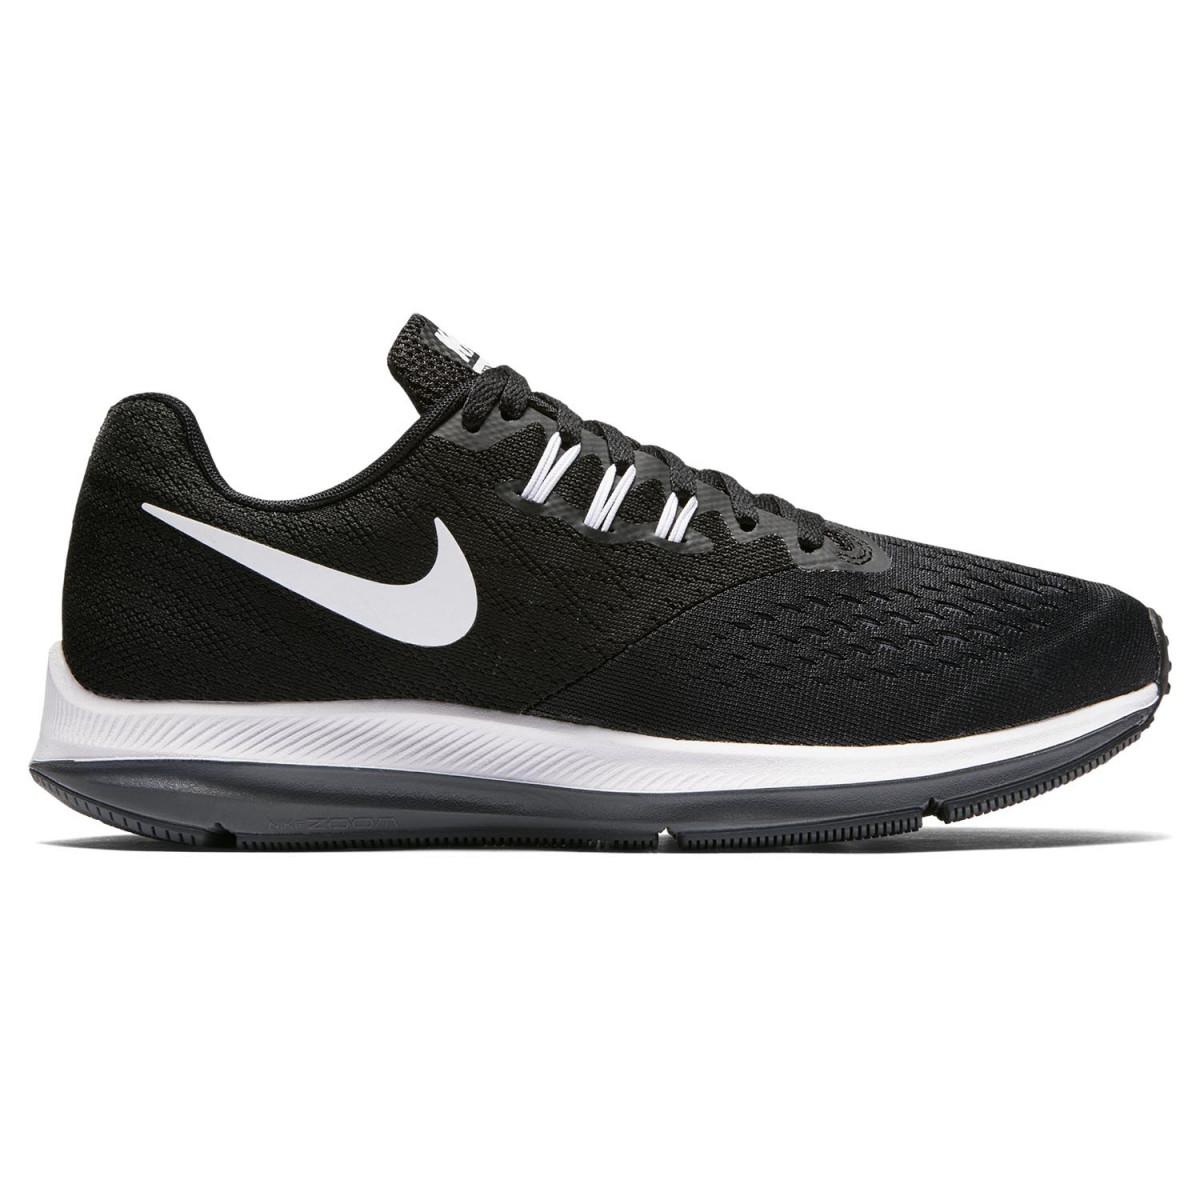 Zapatillas Nike Air Zoom Winflo 4